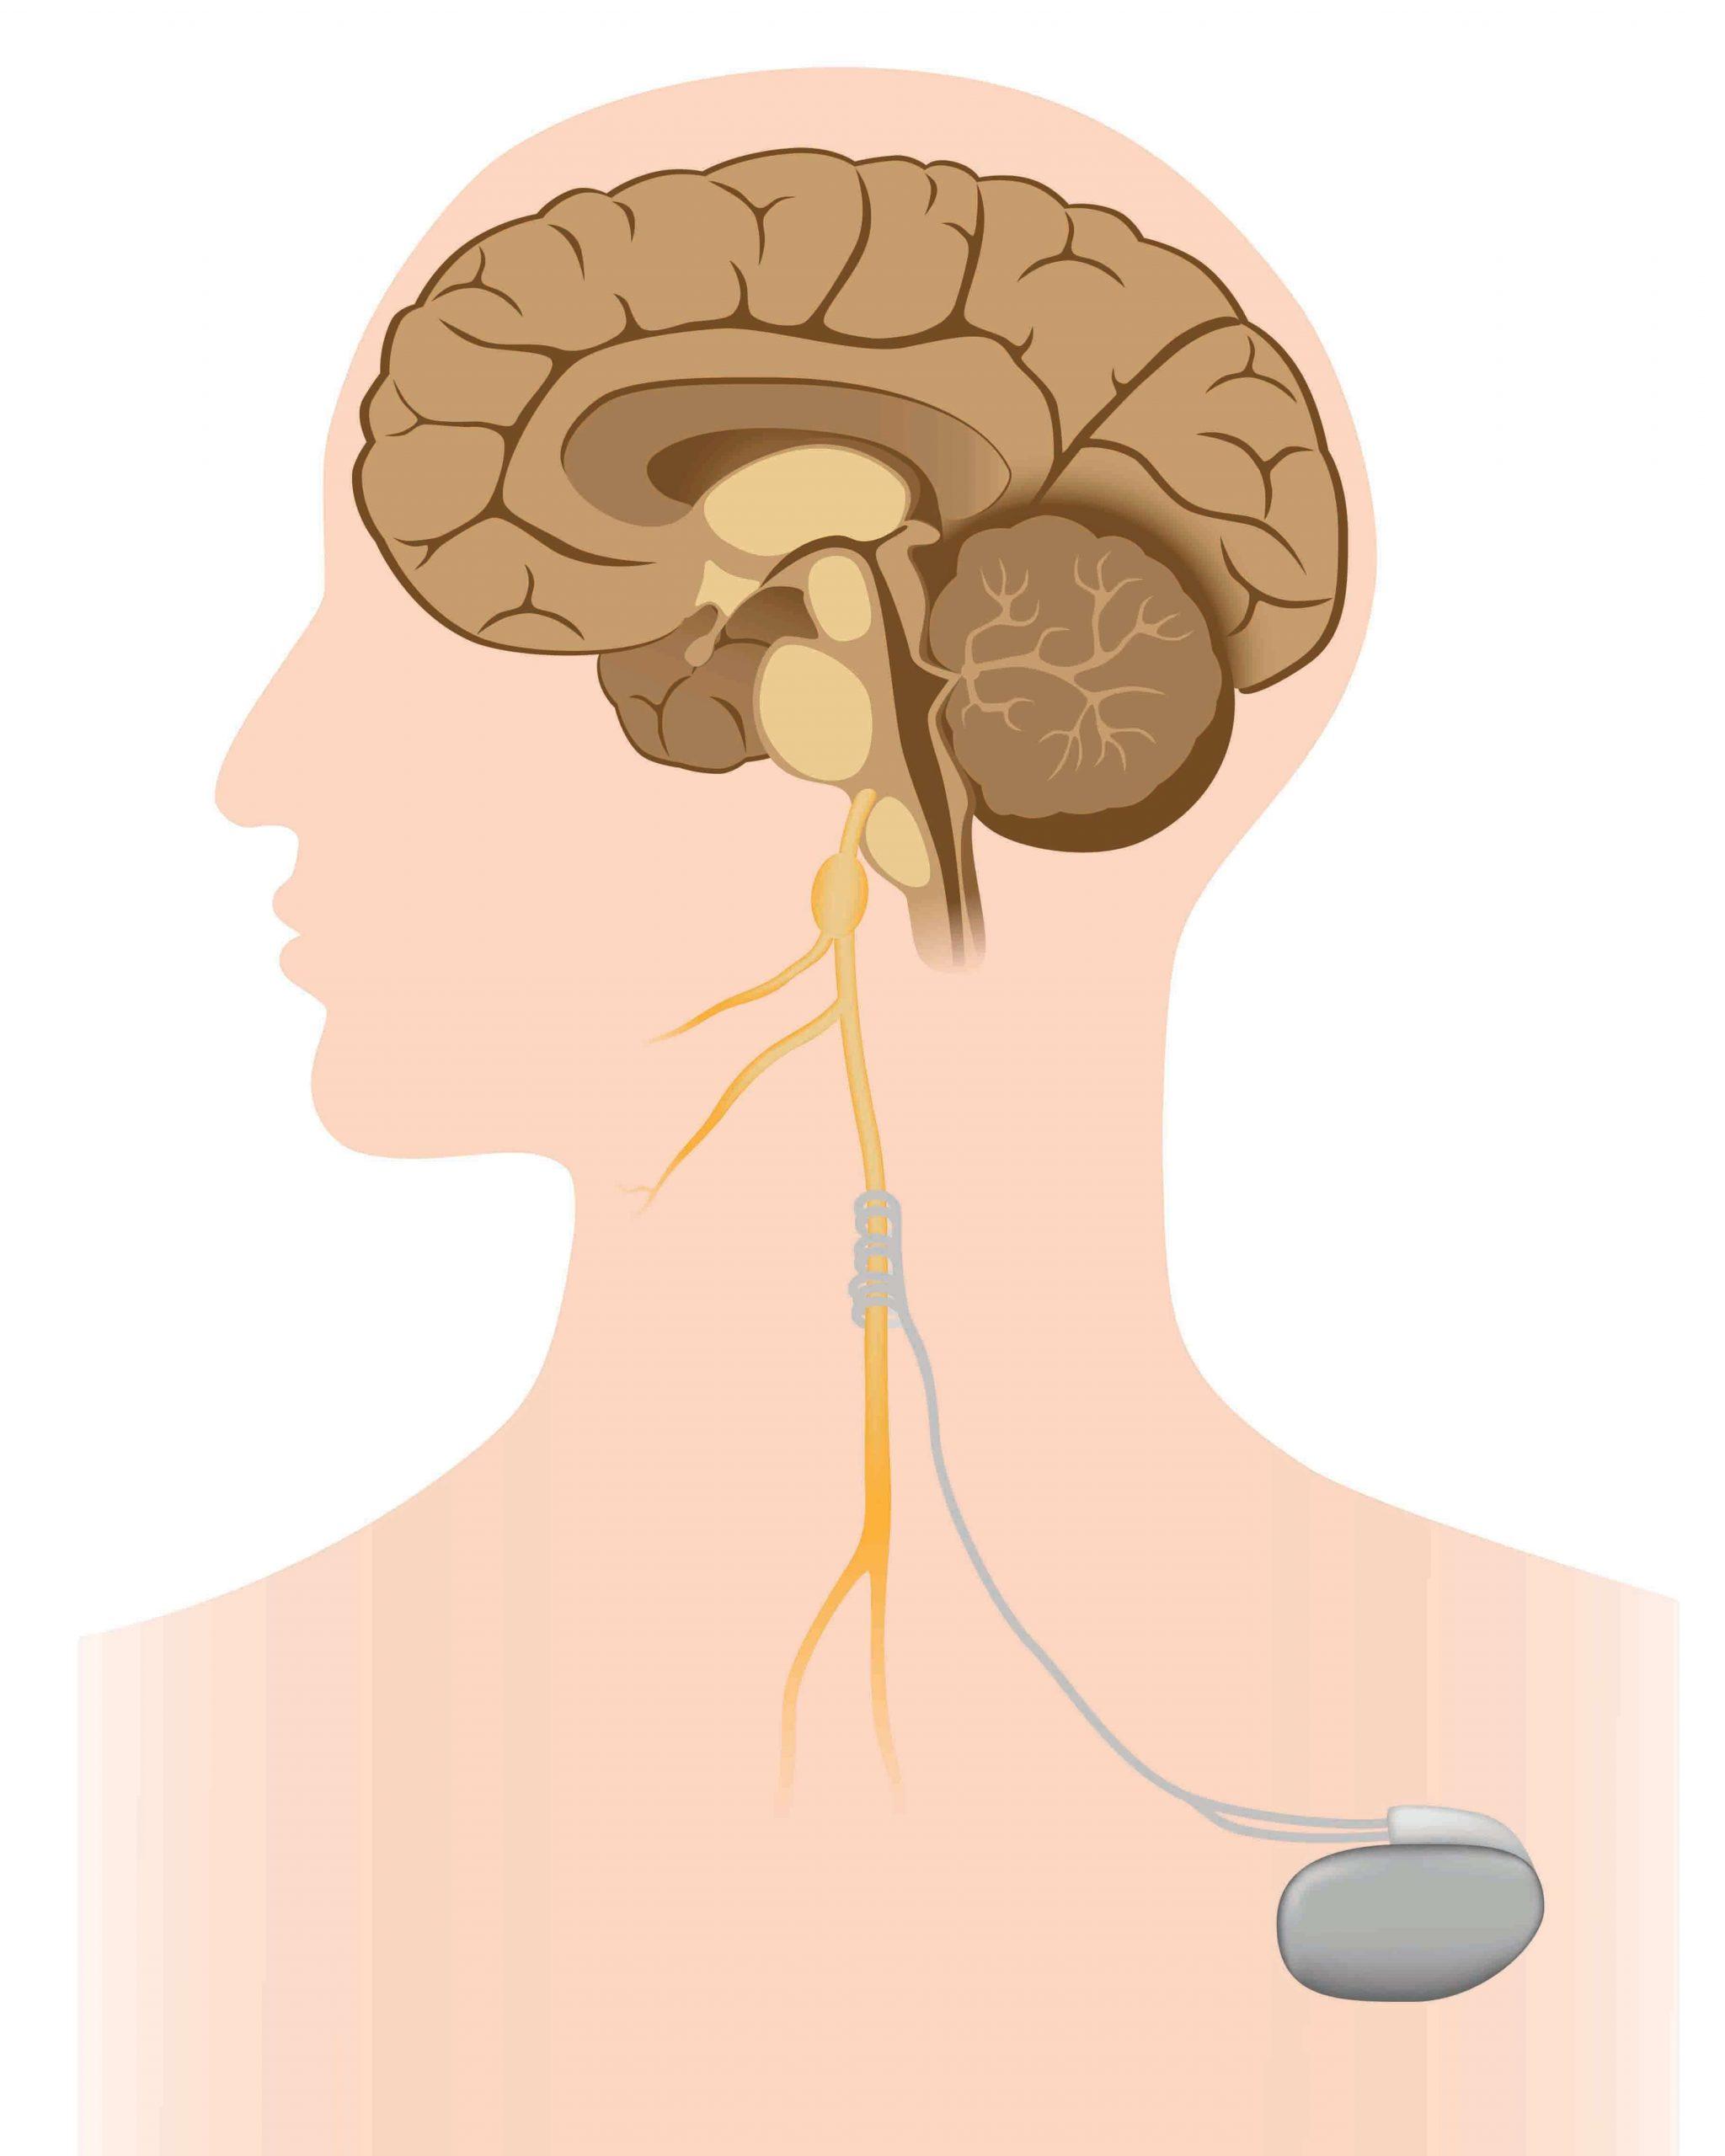 Stimularea nervului vag